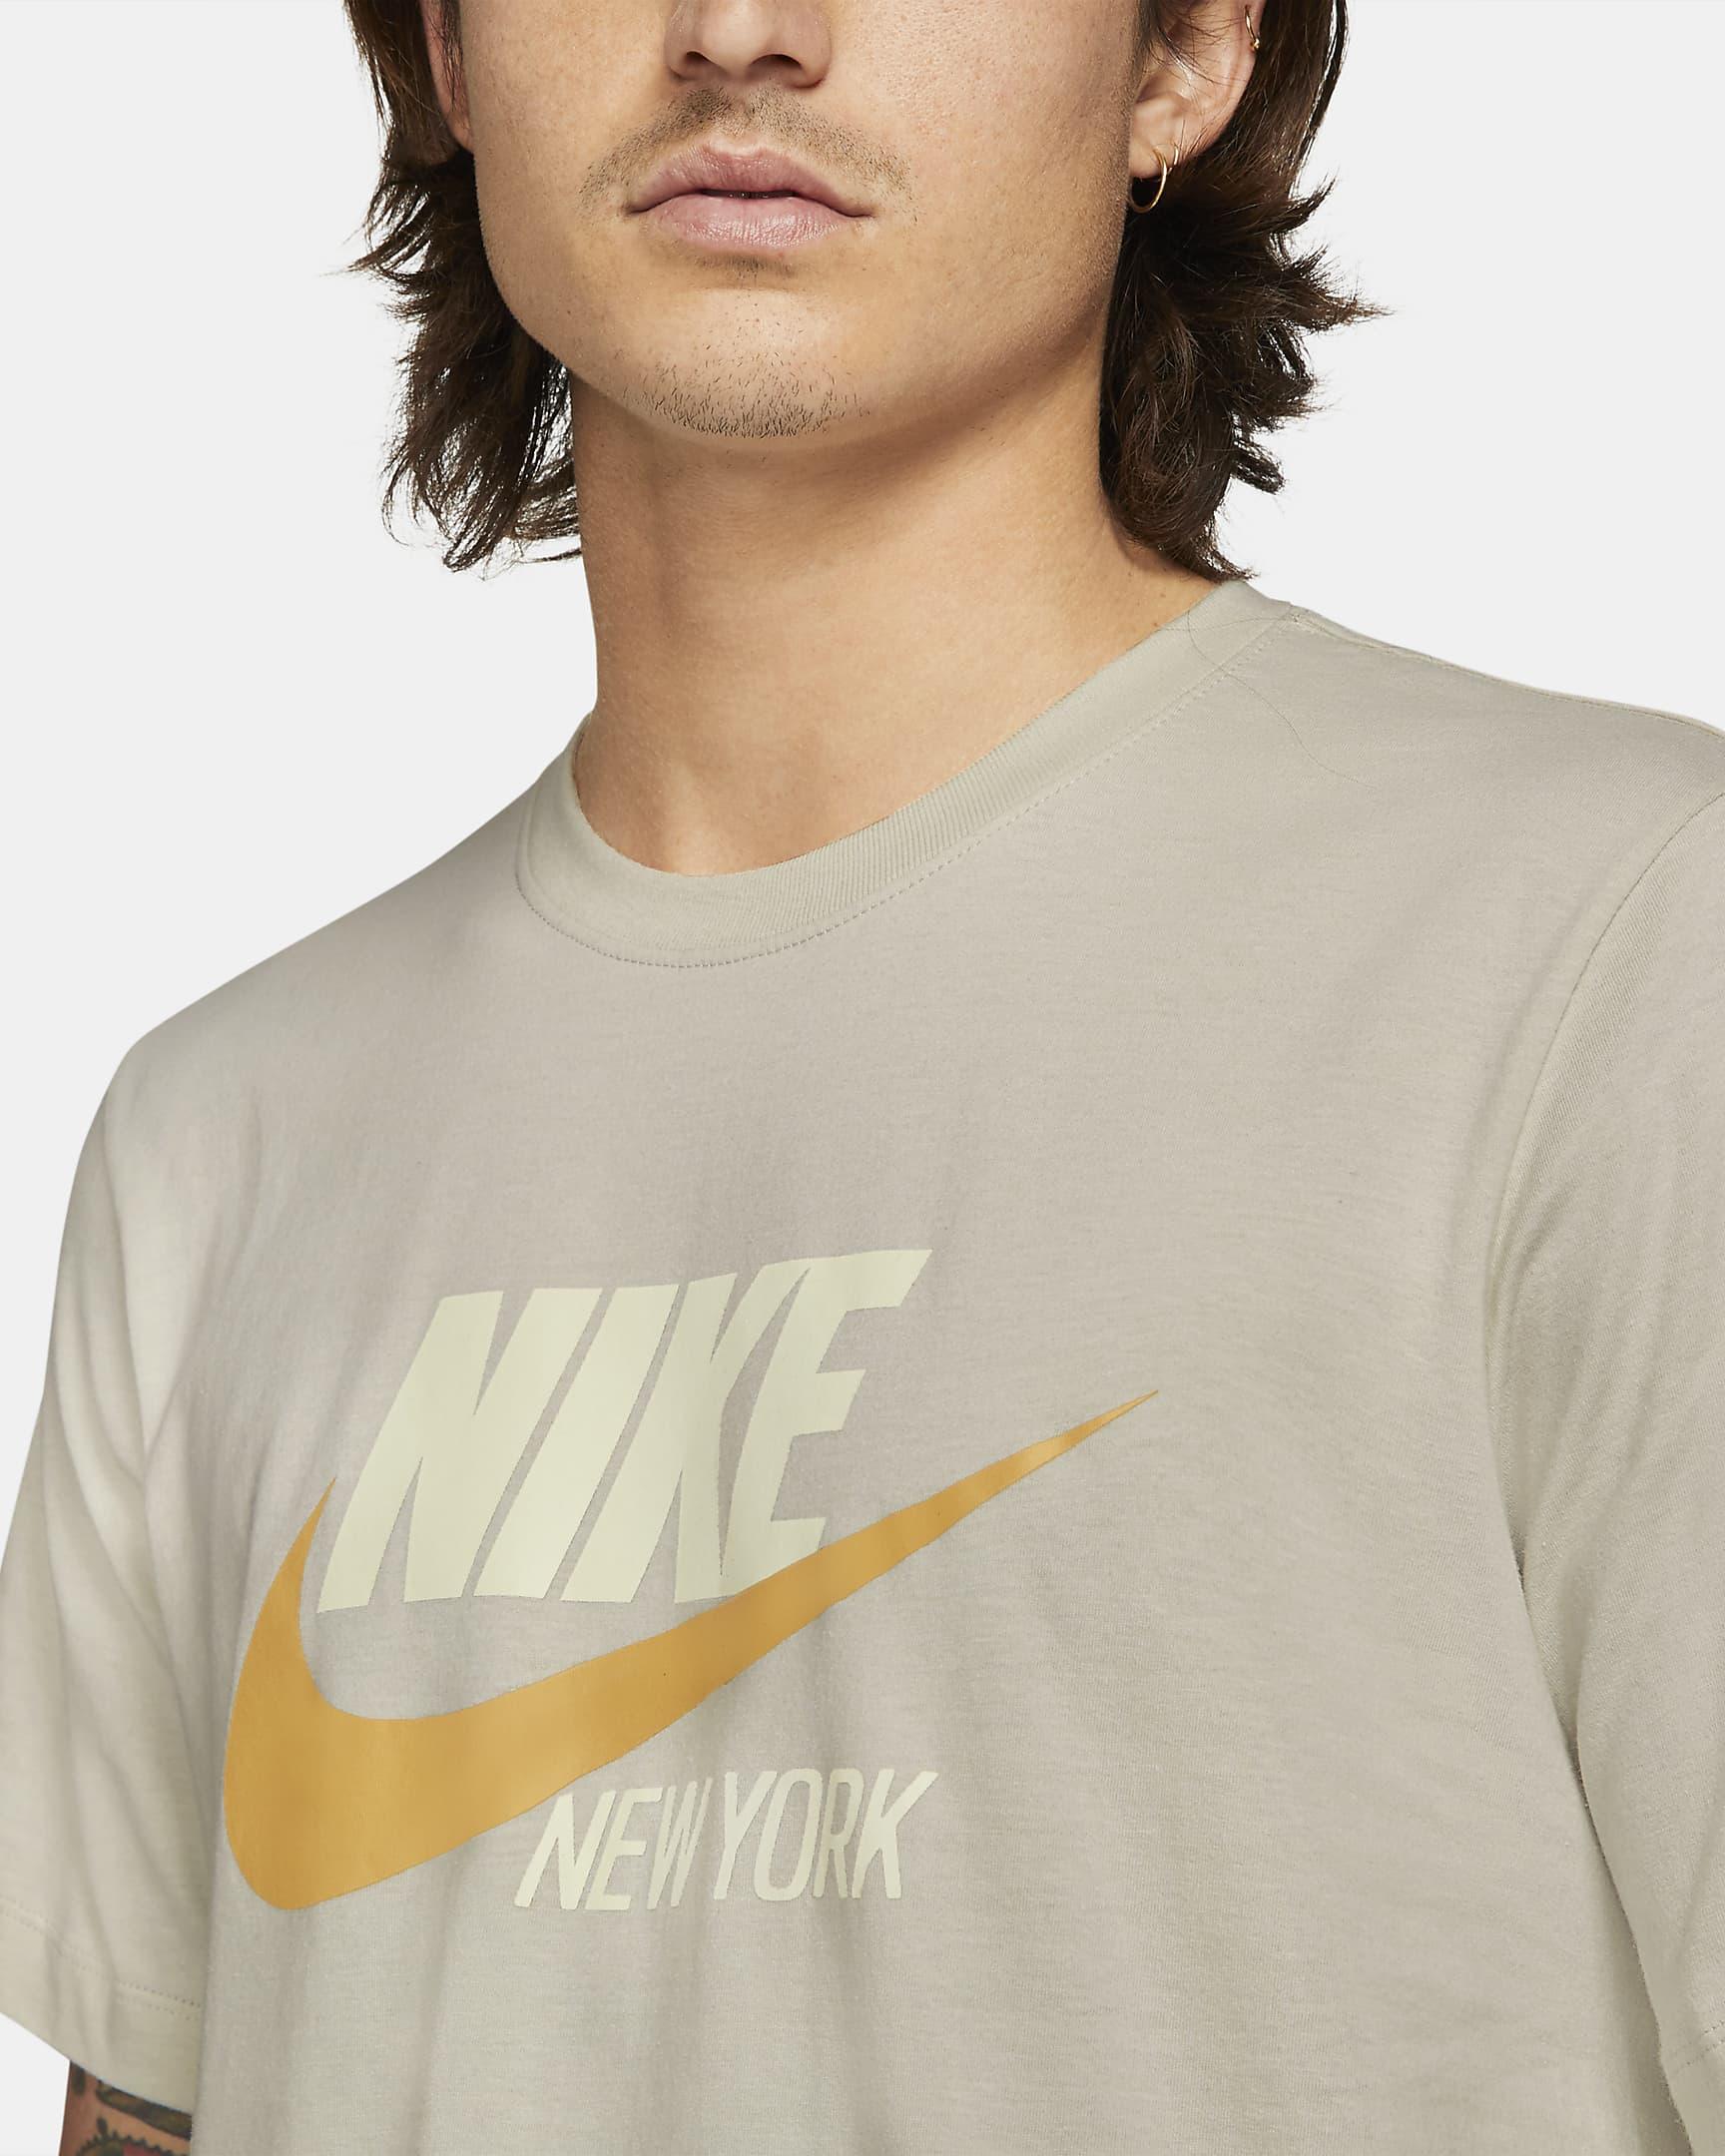 sportswear-mens-t-shirt-Tw8PXS-1